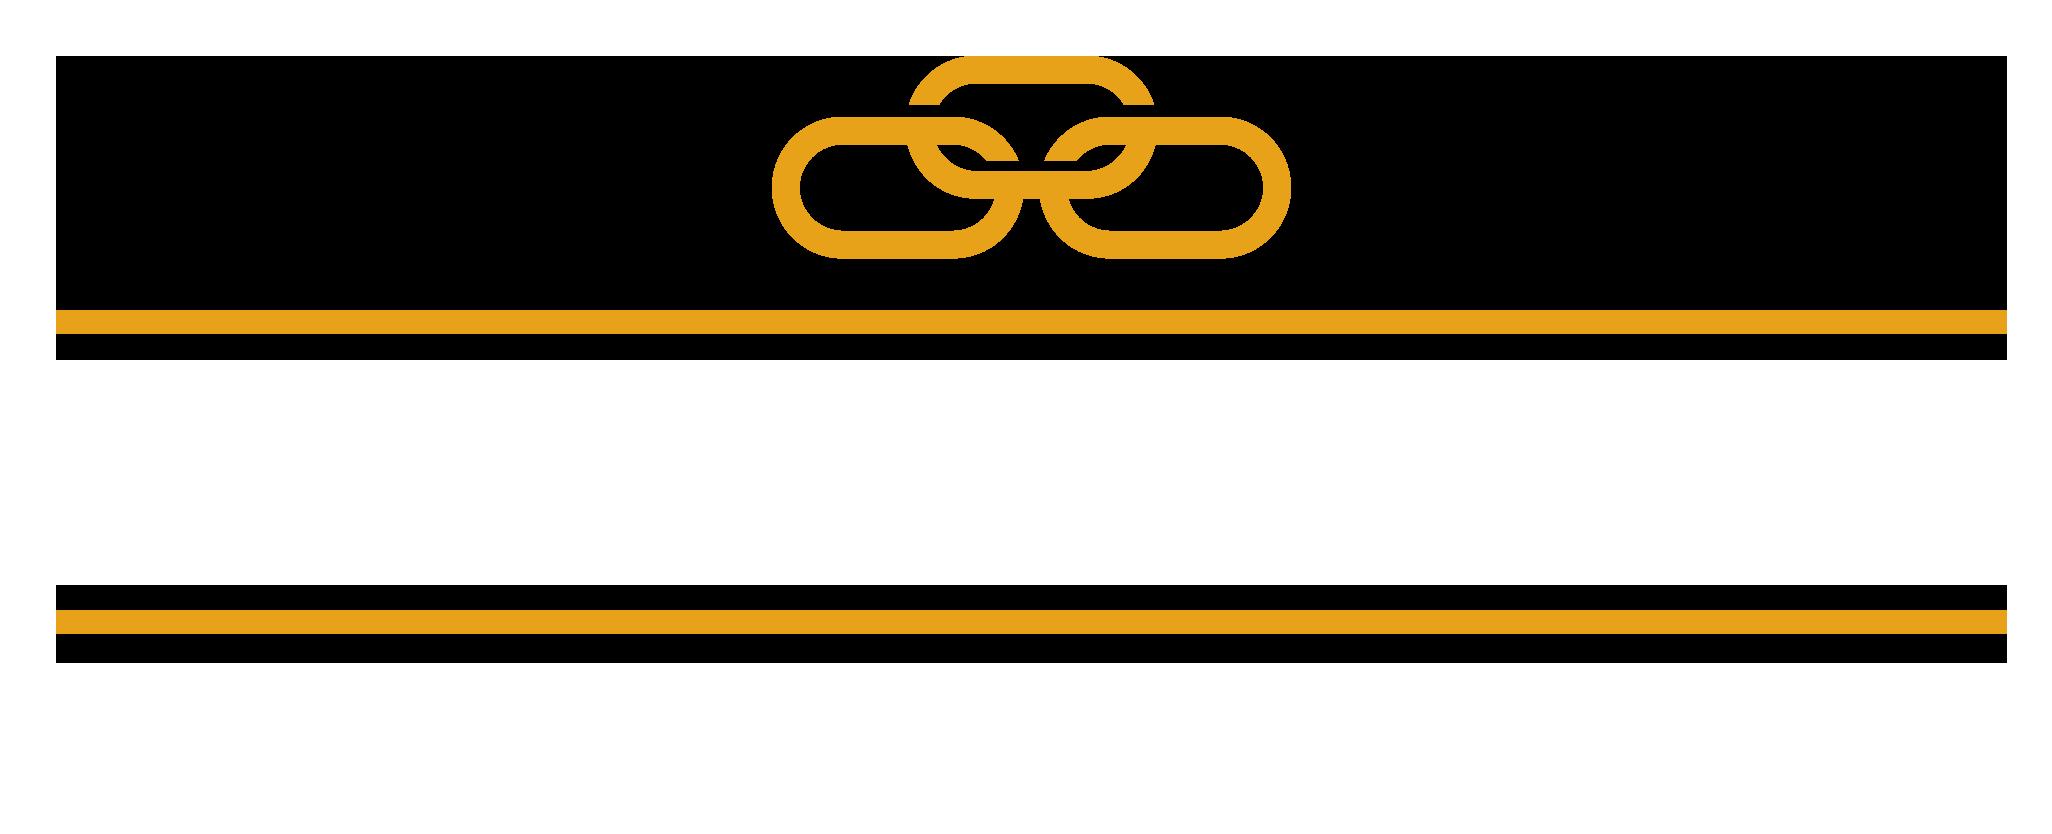 MILLBROOK TACTICAL